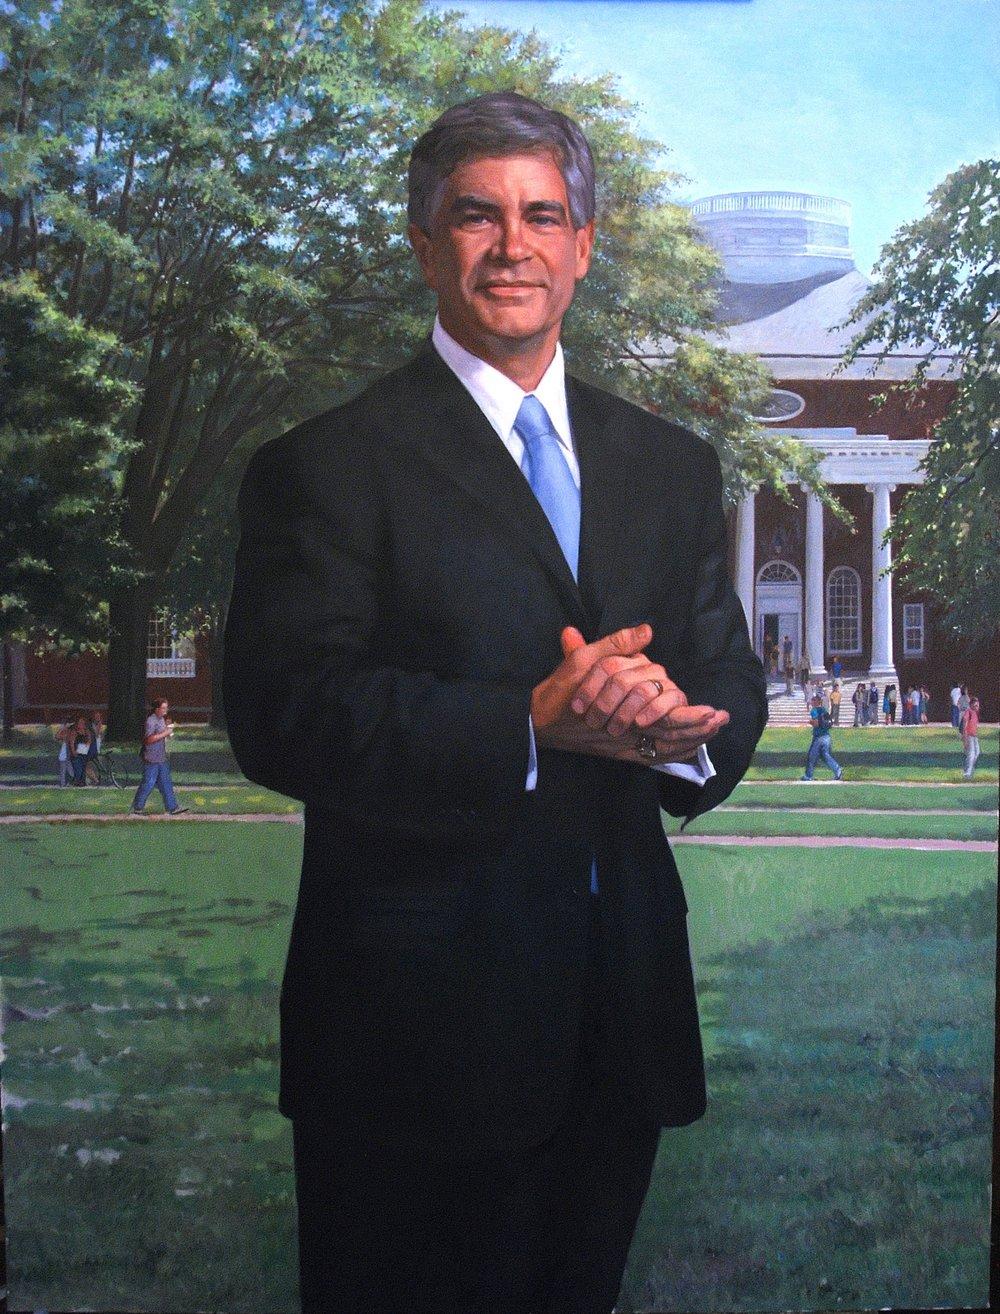 Patrick Harker, President, University of Delaware